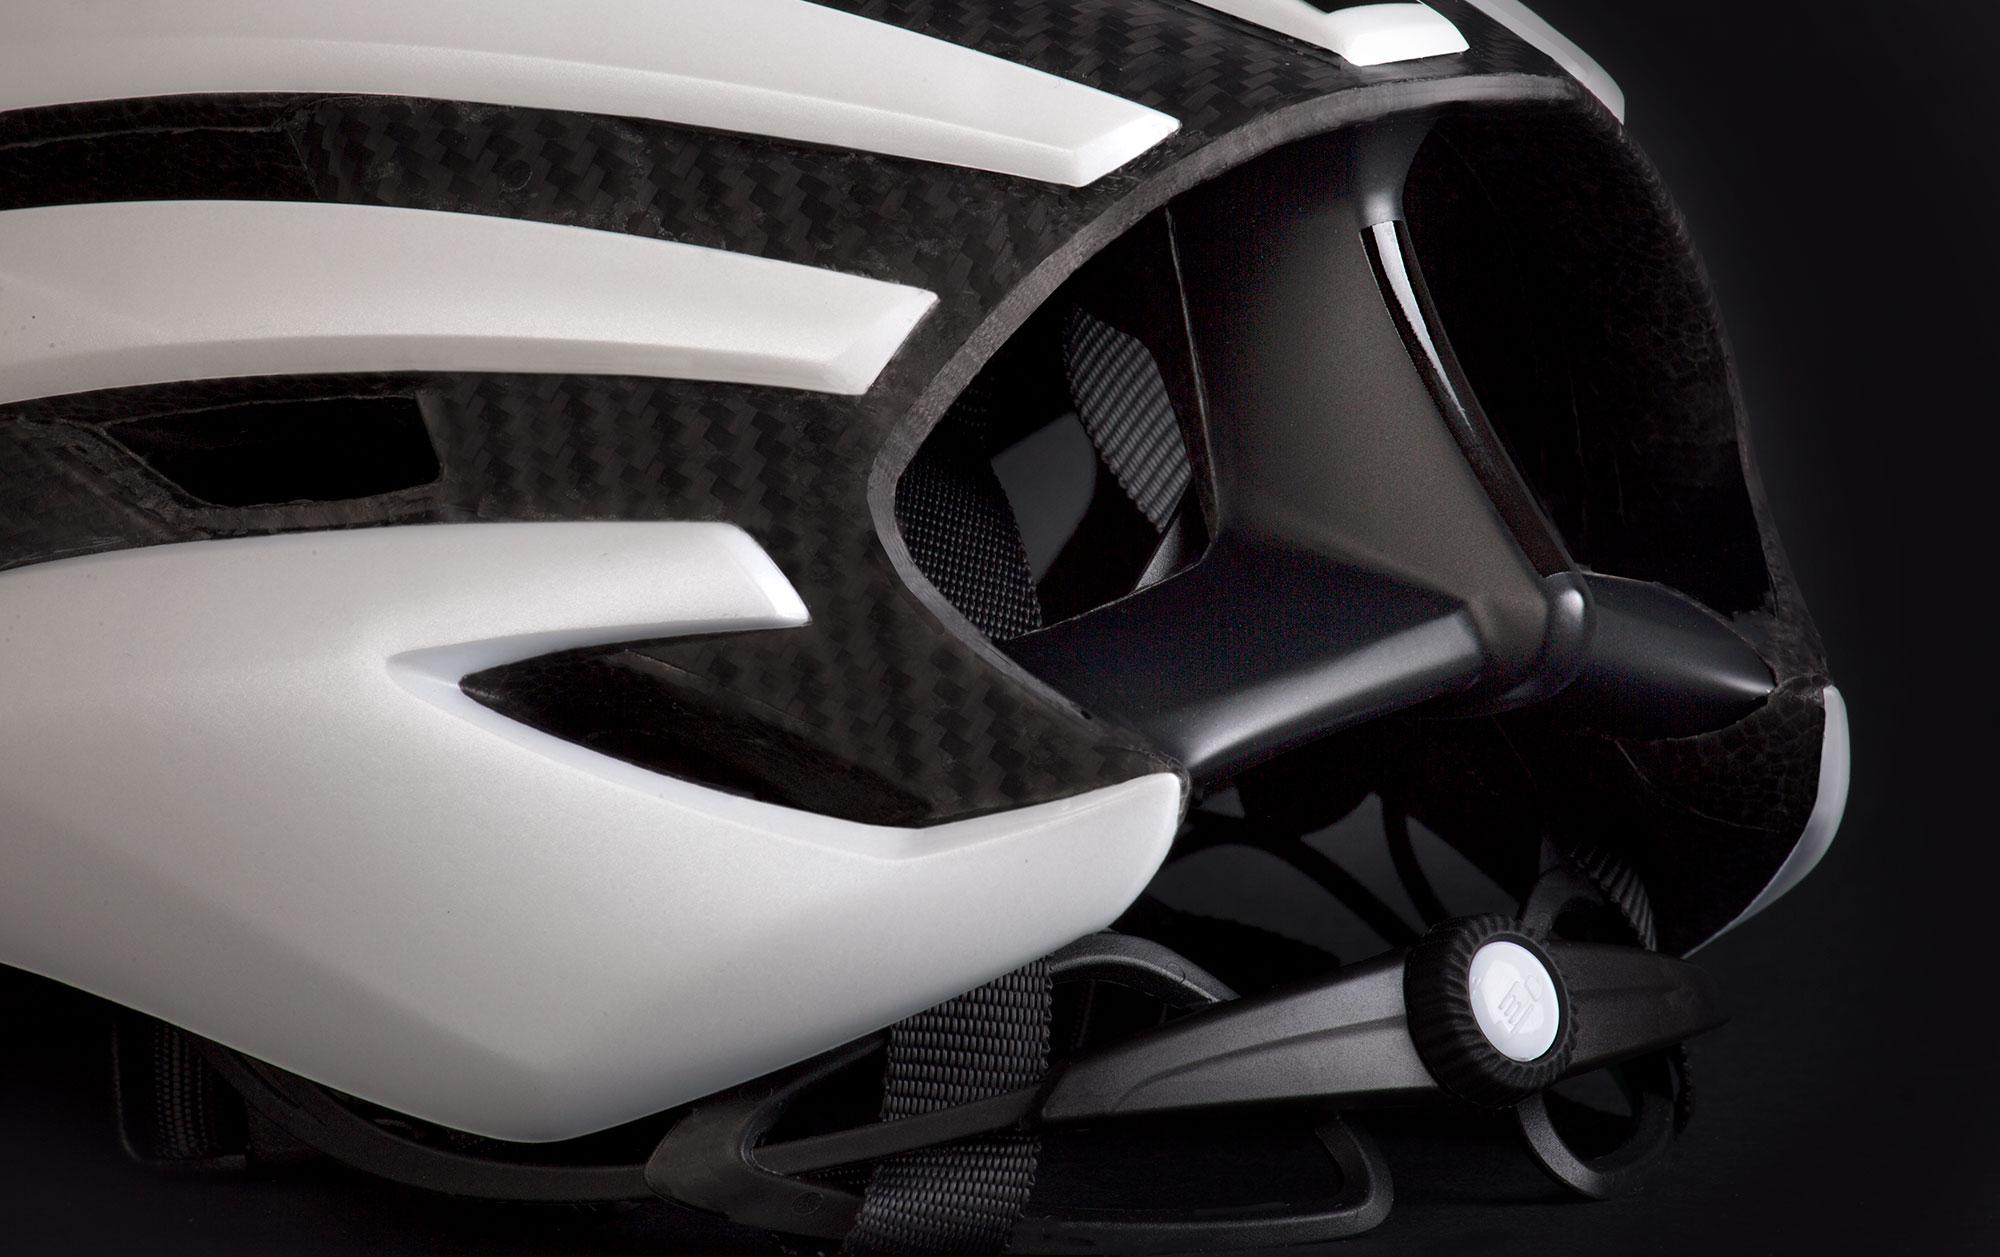 MET Trenta 3K Carbon Road, Aero, Cyclocross and Gravel Helmet rear deflectors